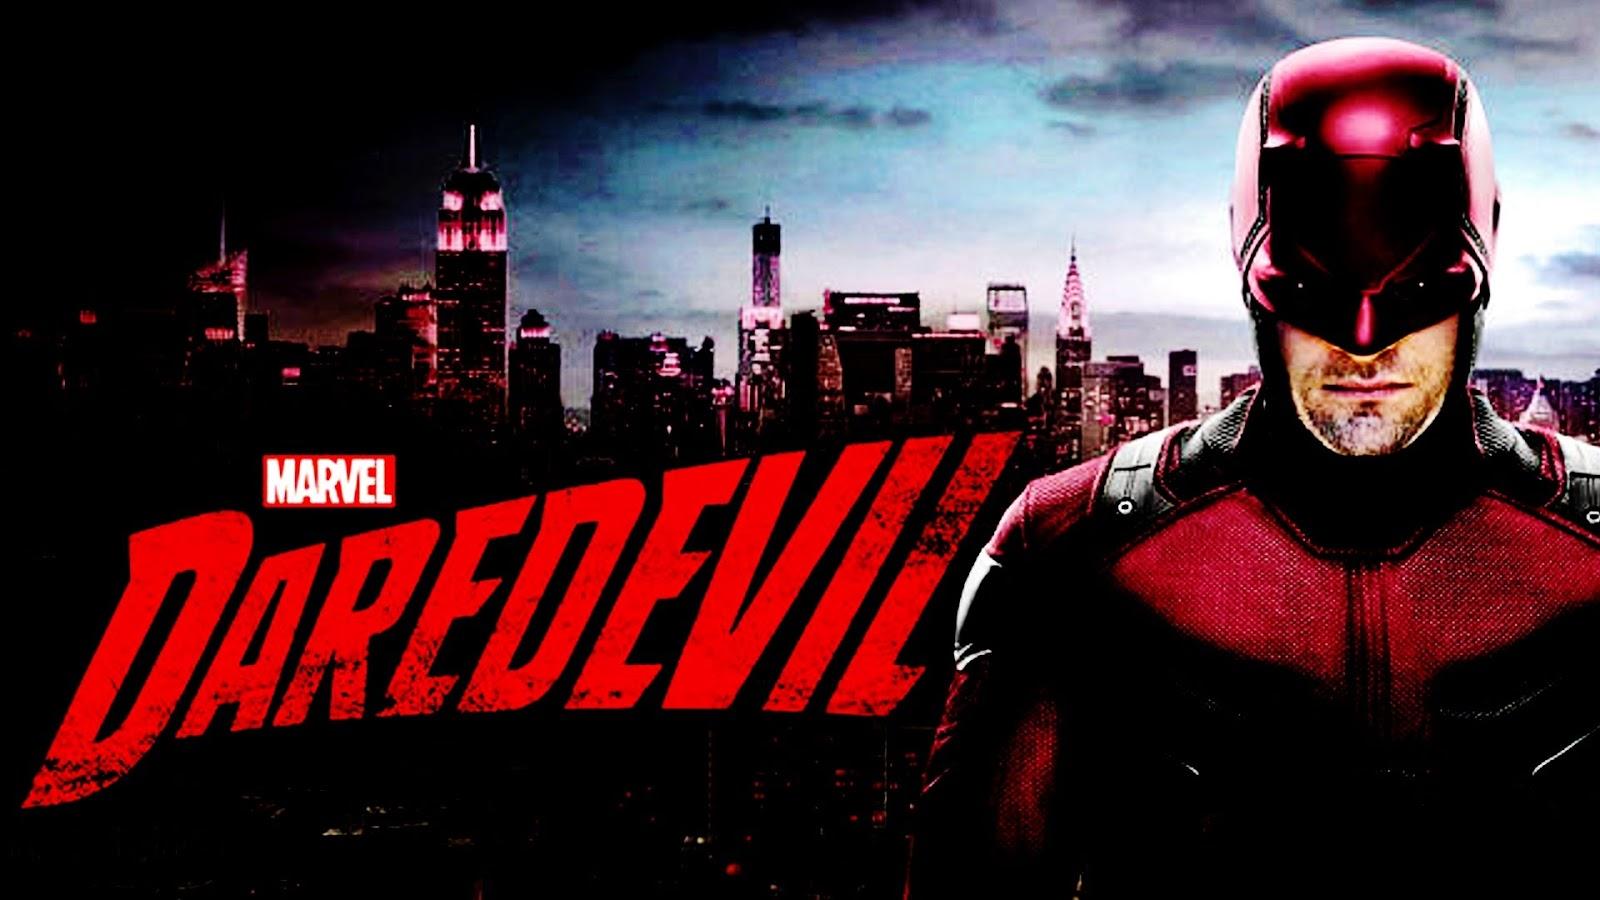 Watch Daredevil Season 2 Online Free DAREDEVIL SEASON 1 EPISODE 2